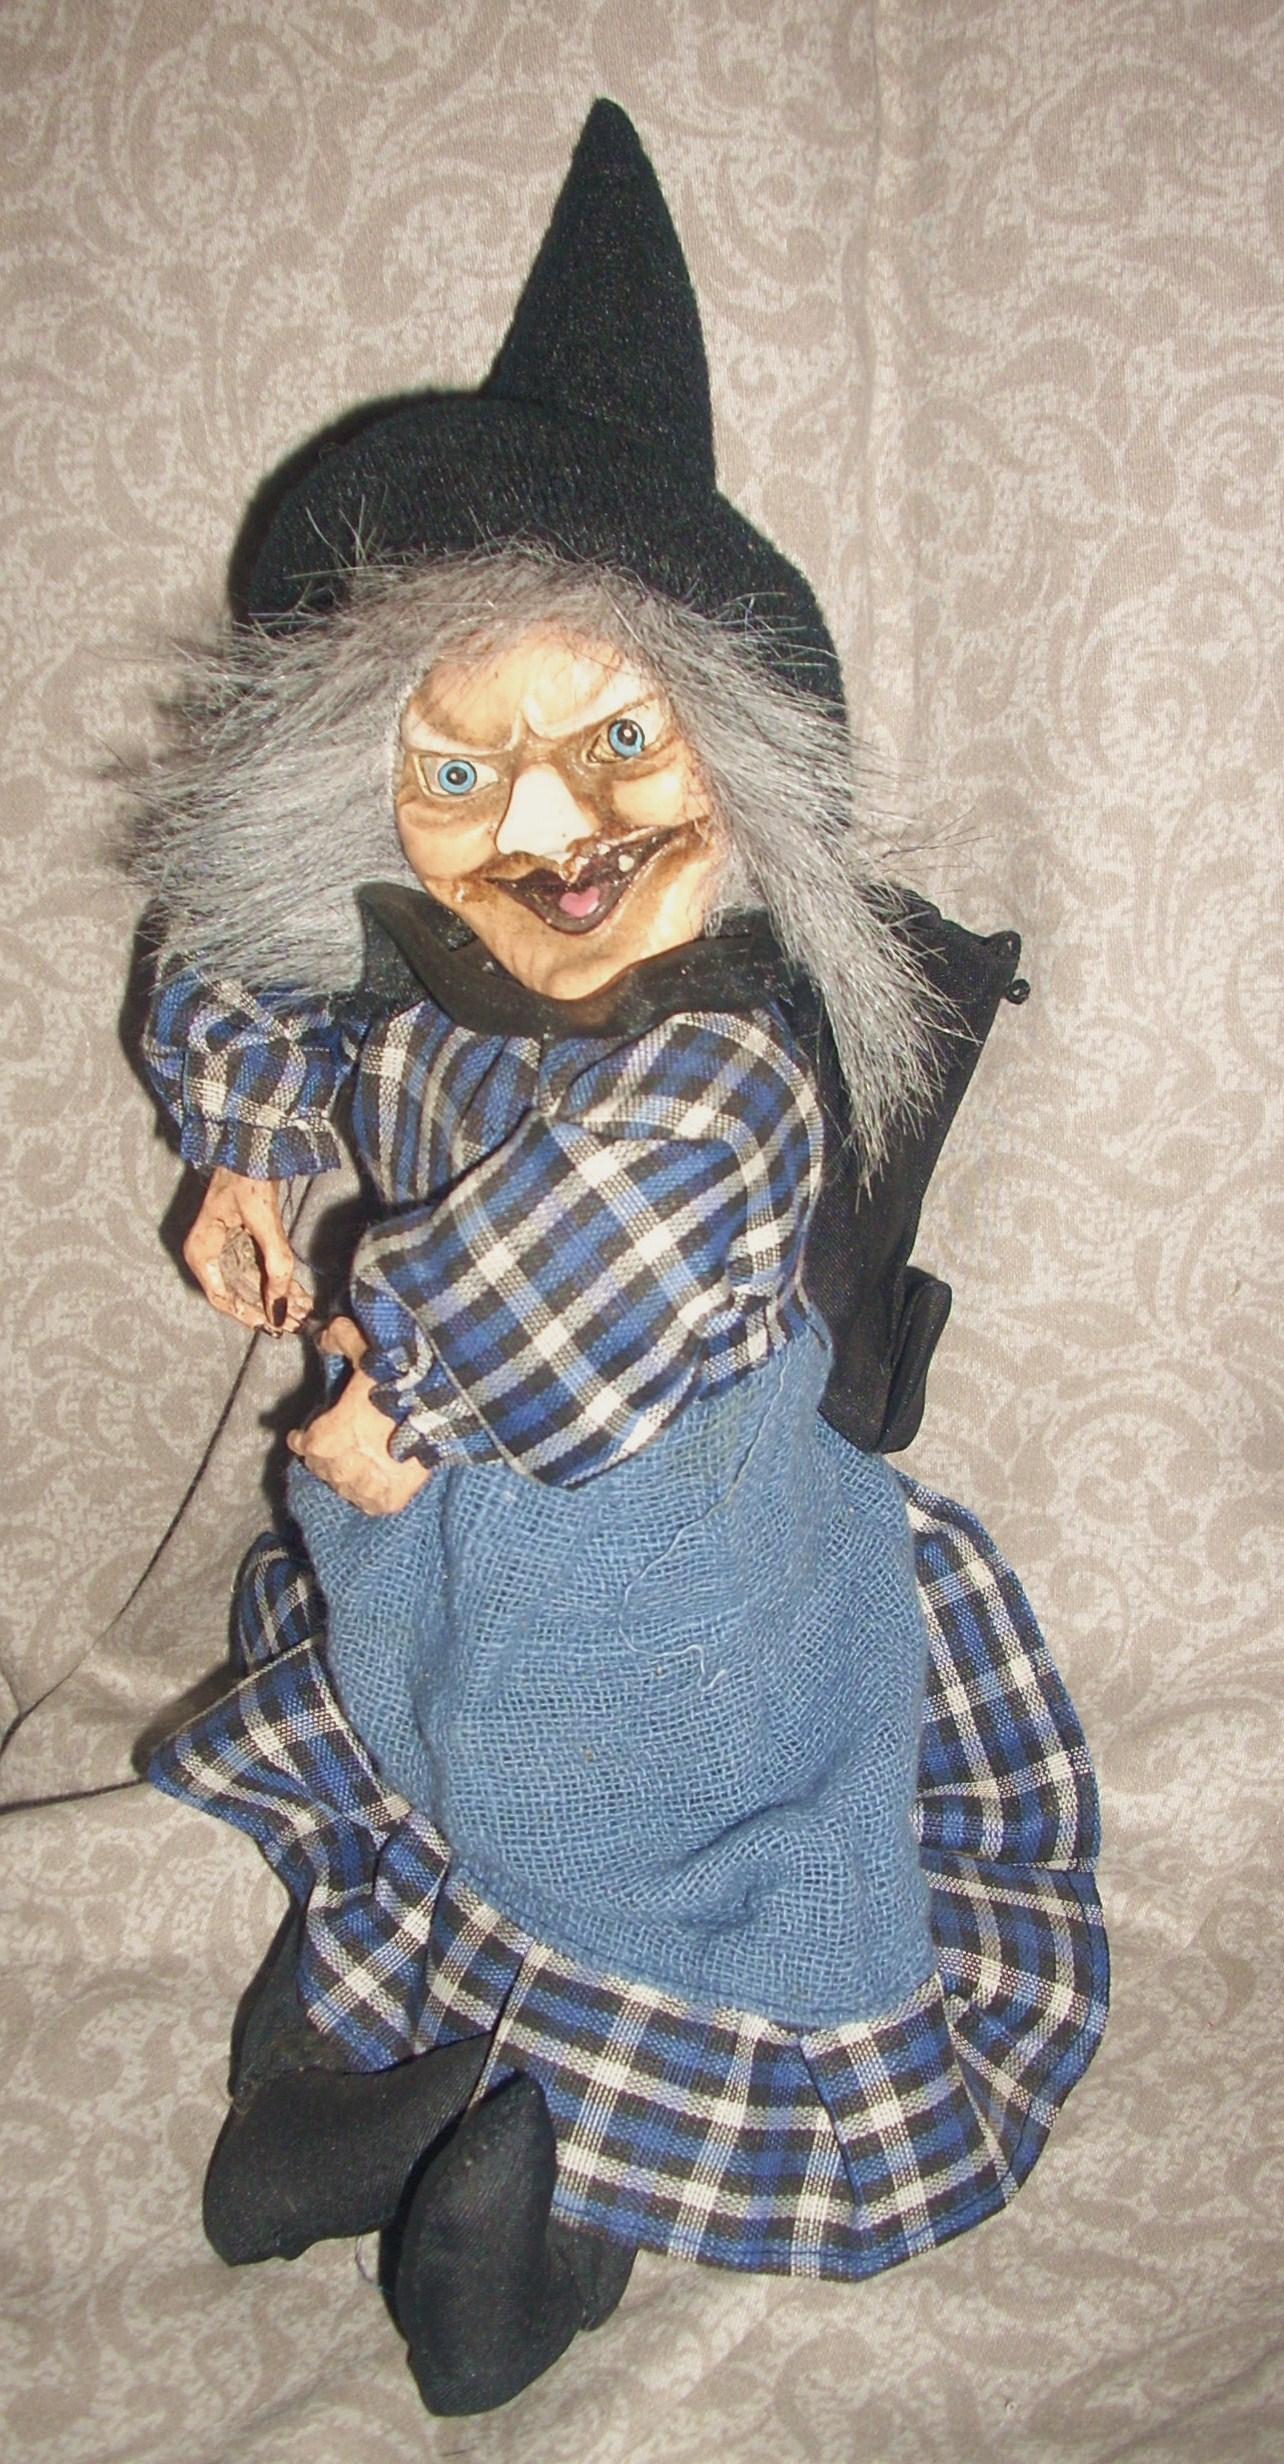 An Italian witch doll, La Befana